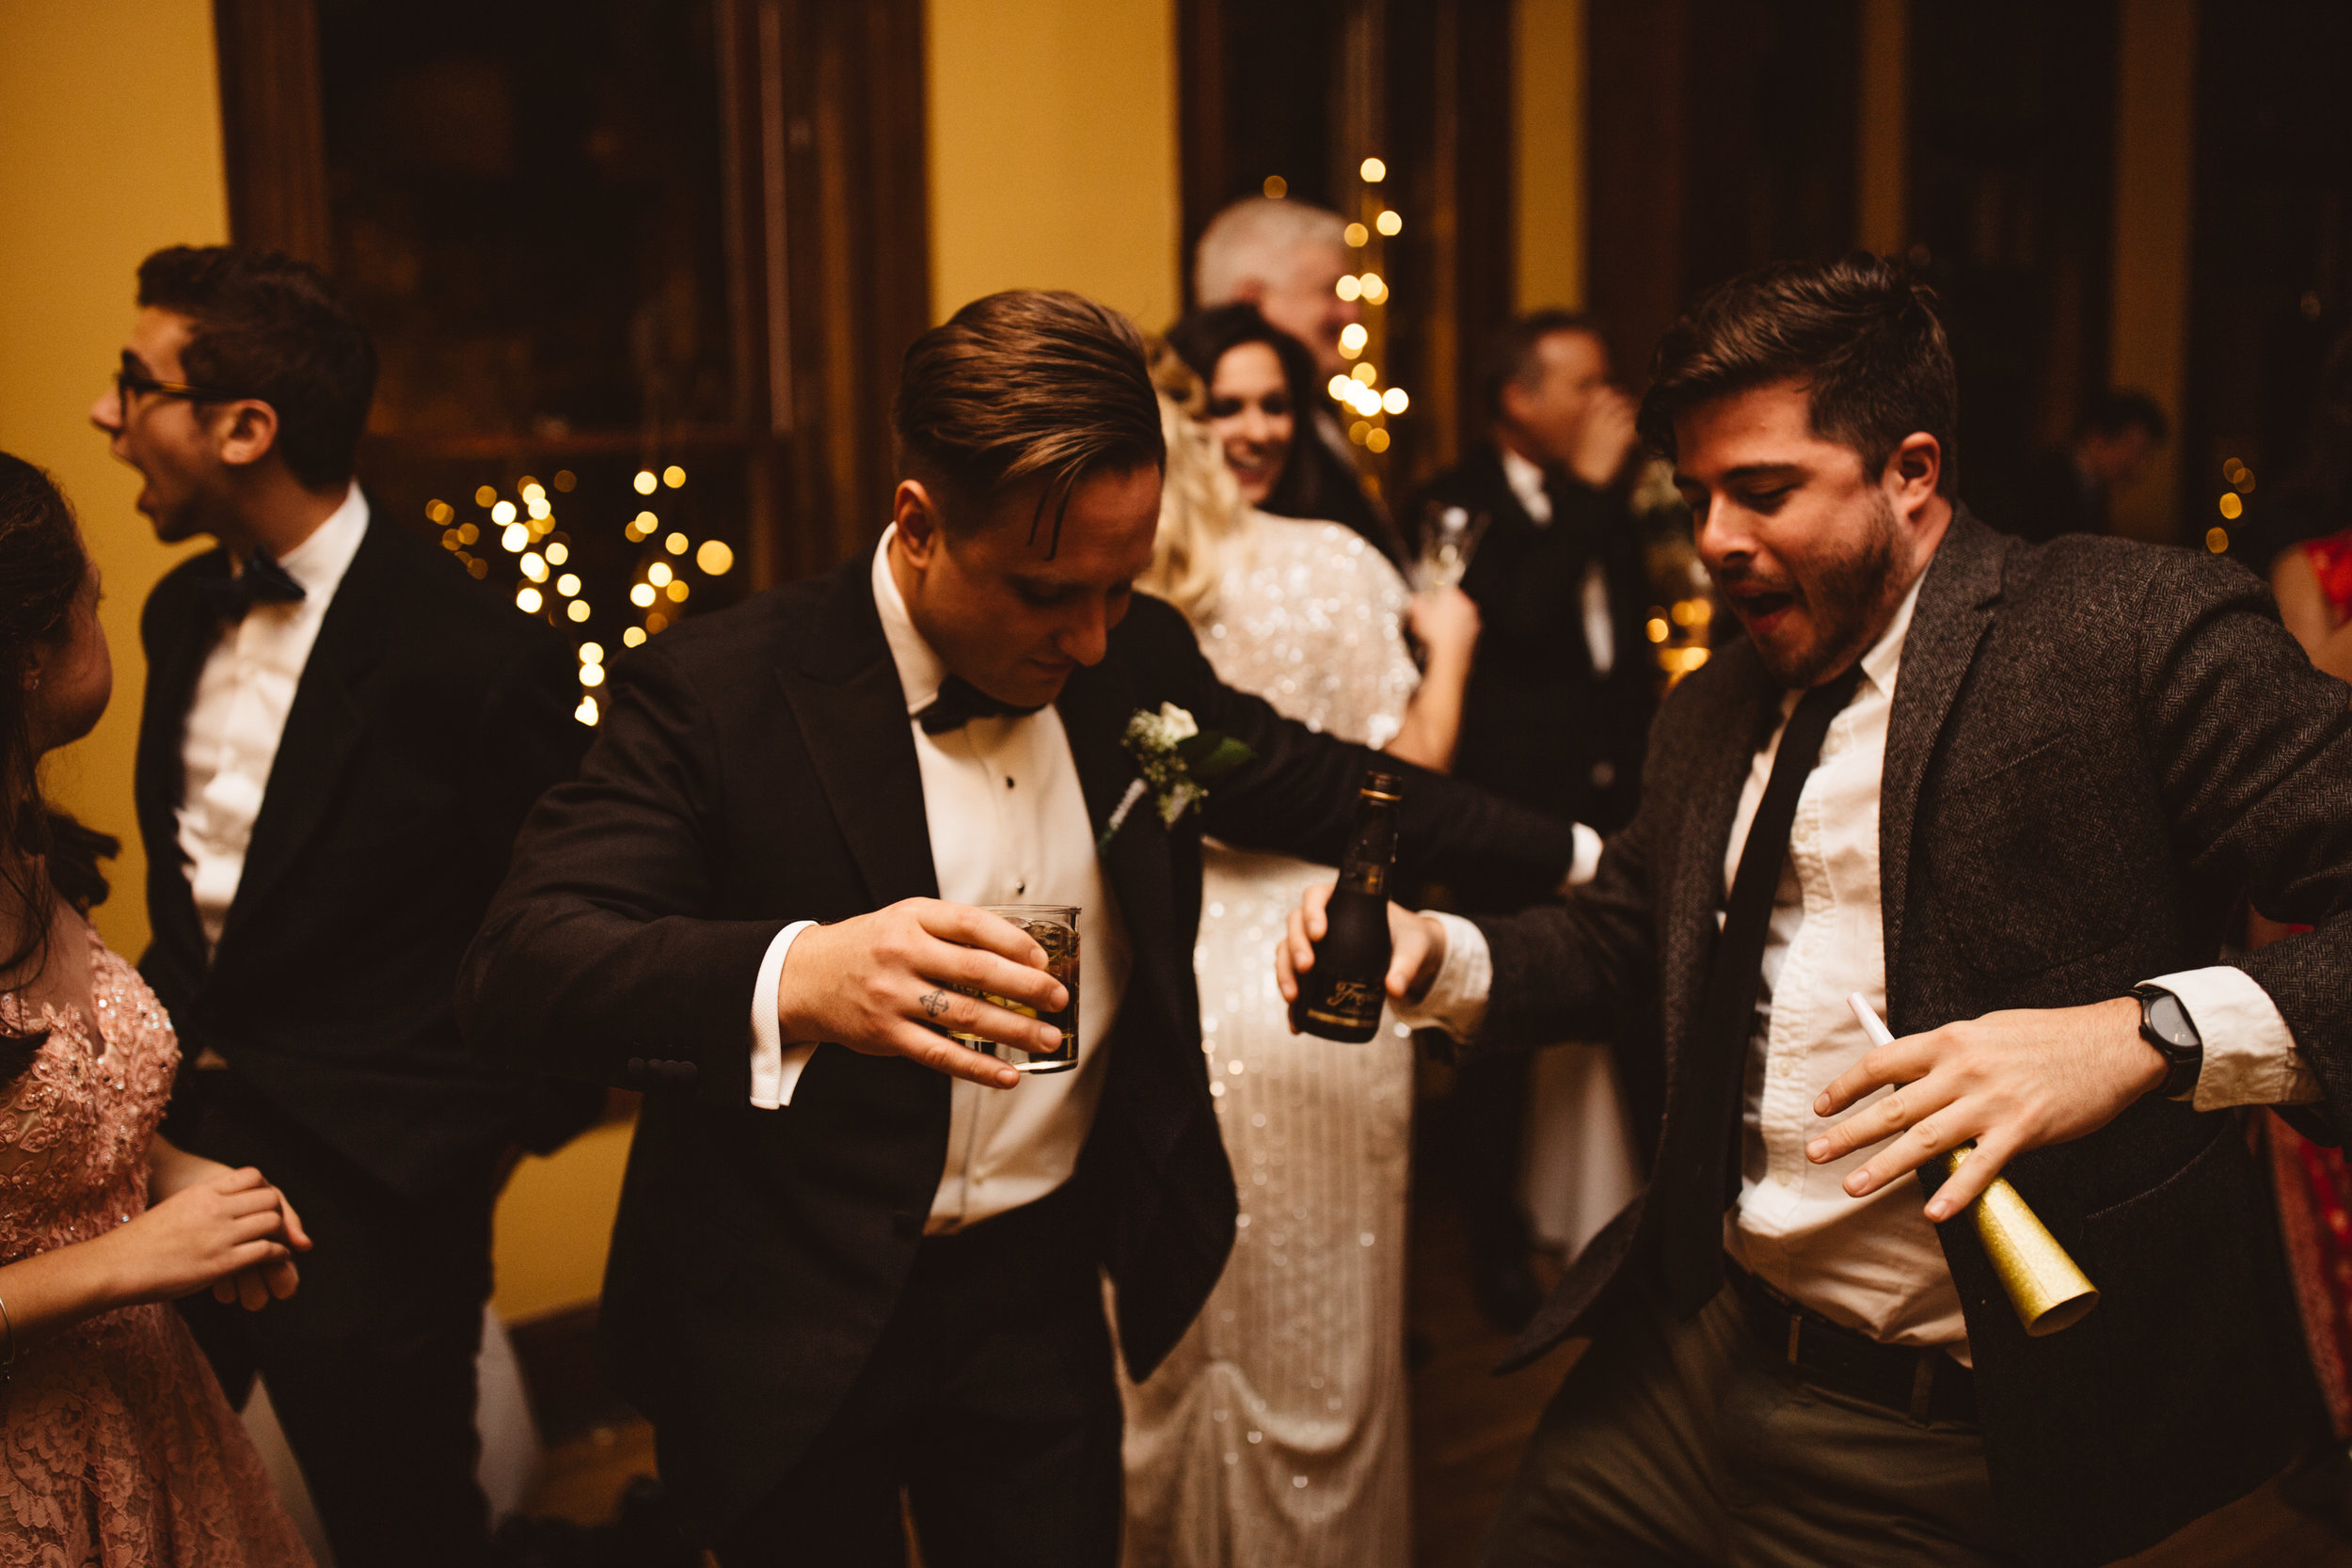 Mattie Bell Photography- Kelly & Zack Wedding Atlanta Brewery -427.jpg